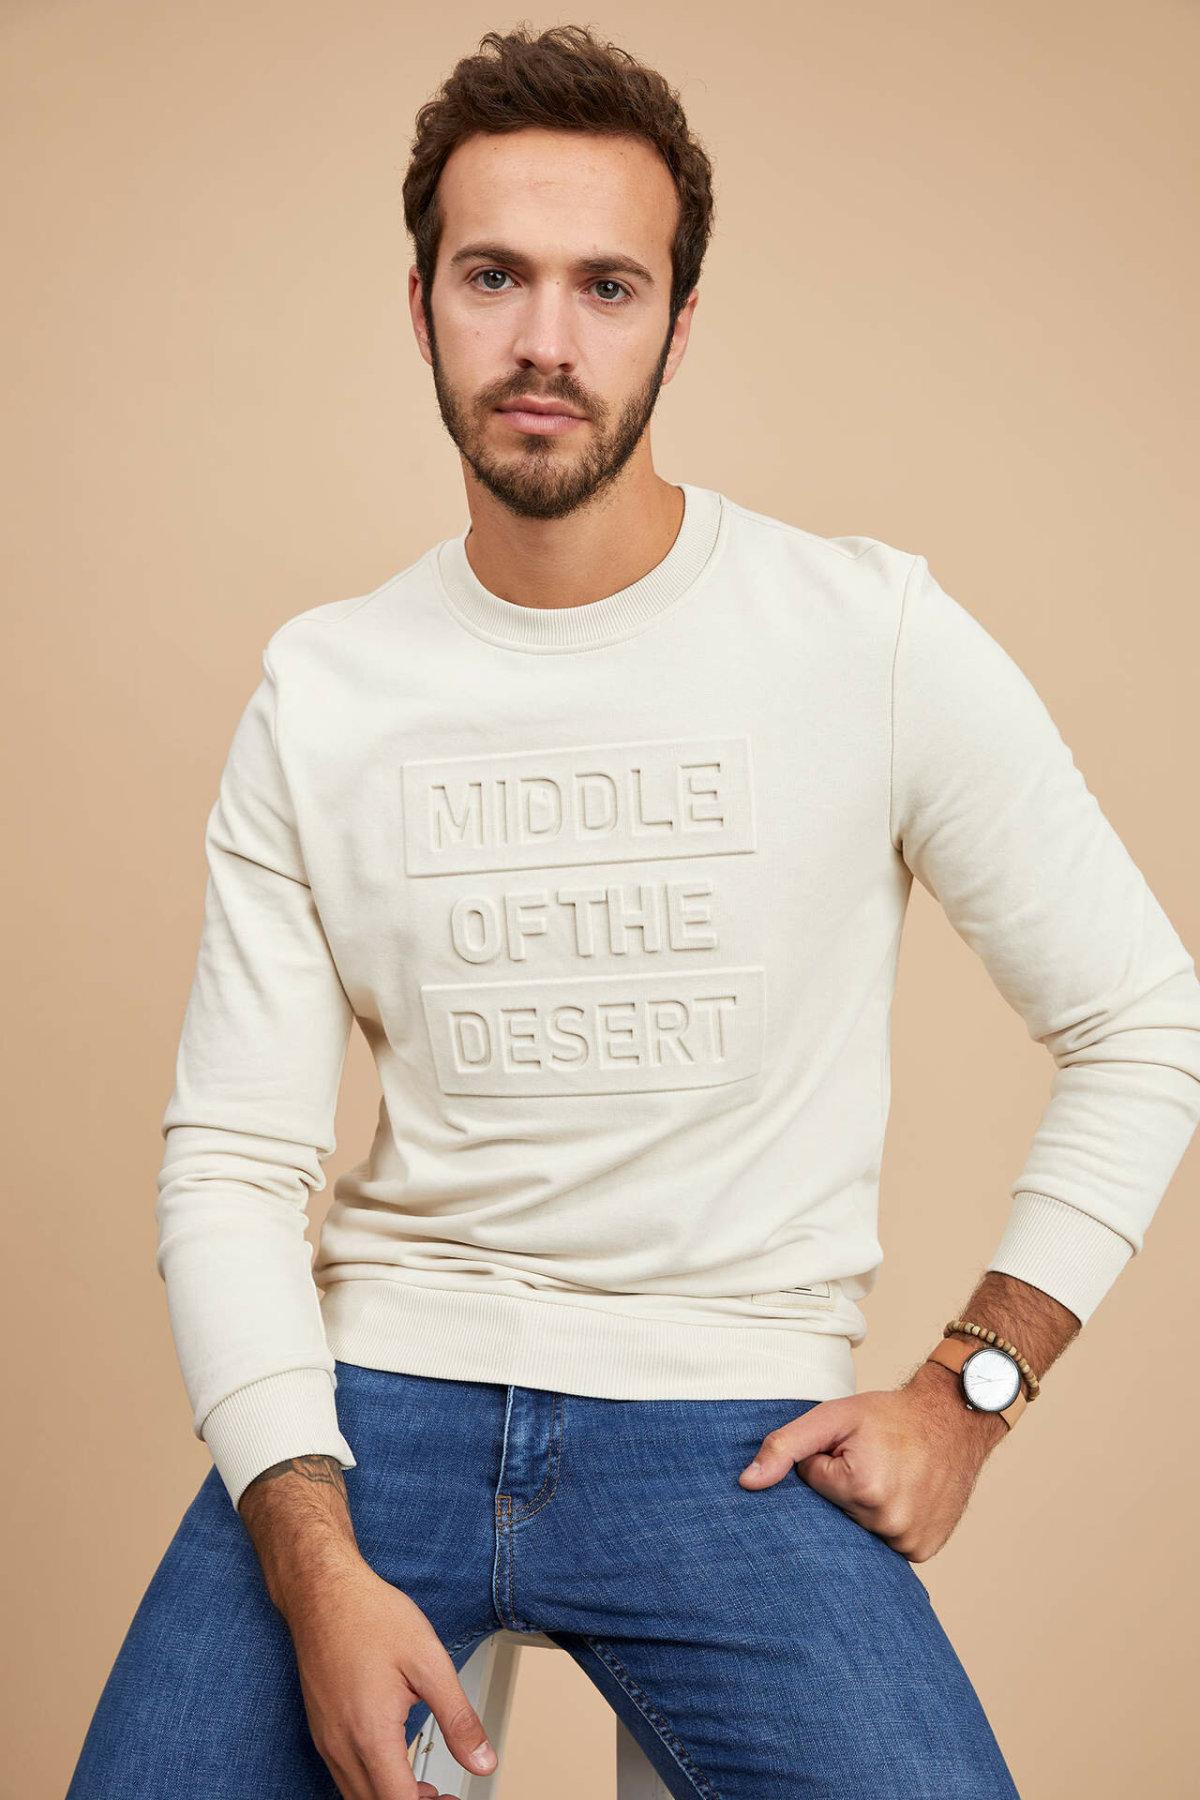 DeFacto Man's White Sweatshirt Men's Casual Hoodies Long Sleeve Hoodie For Men Spring Men Sweatshirt -M5413AZ20SP